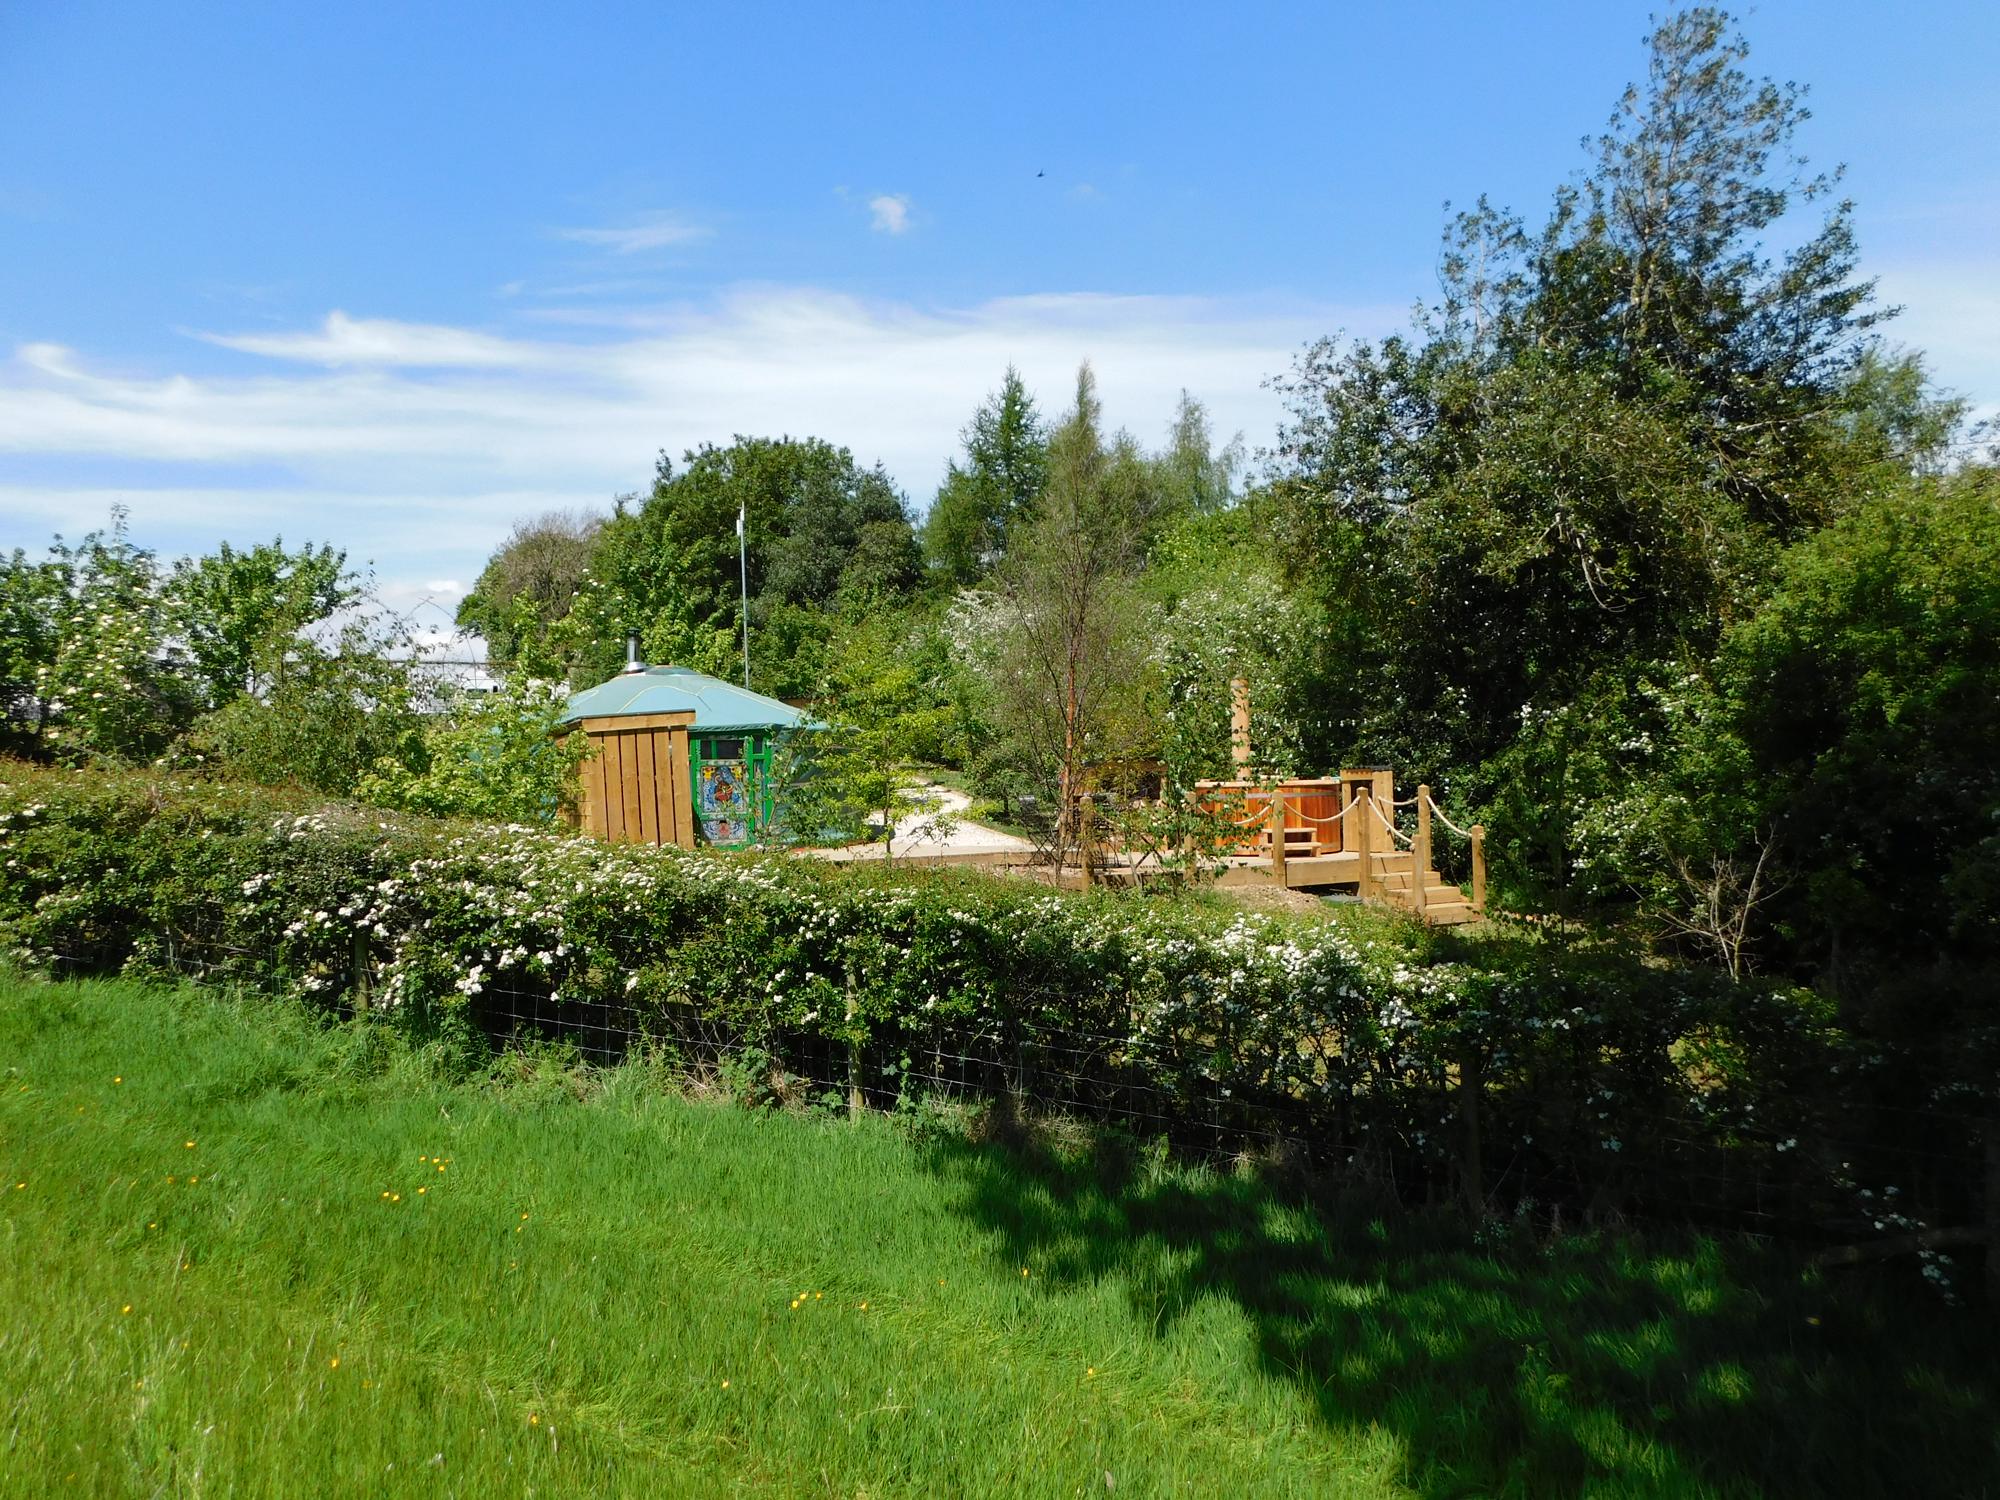 Campsites in Hartington holidays at Cool Camping